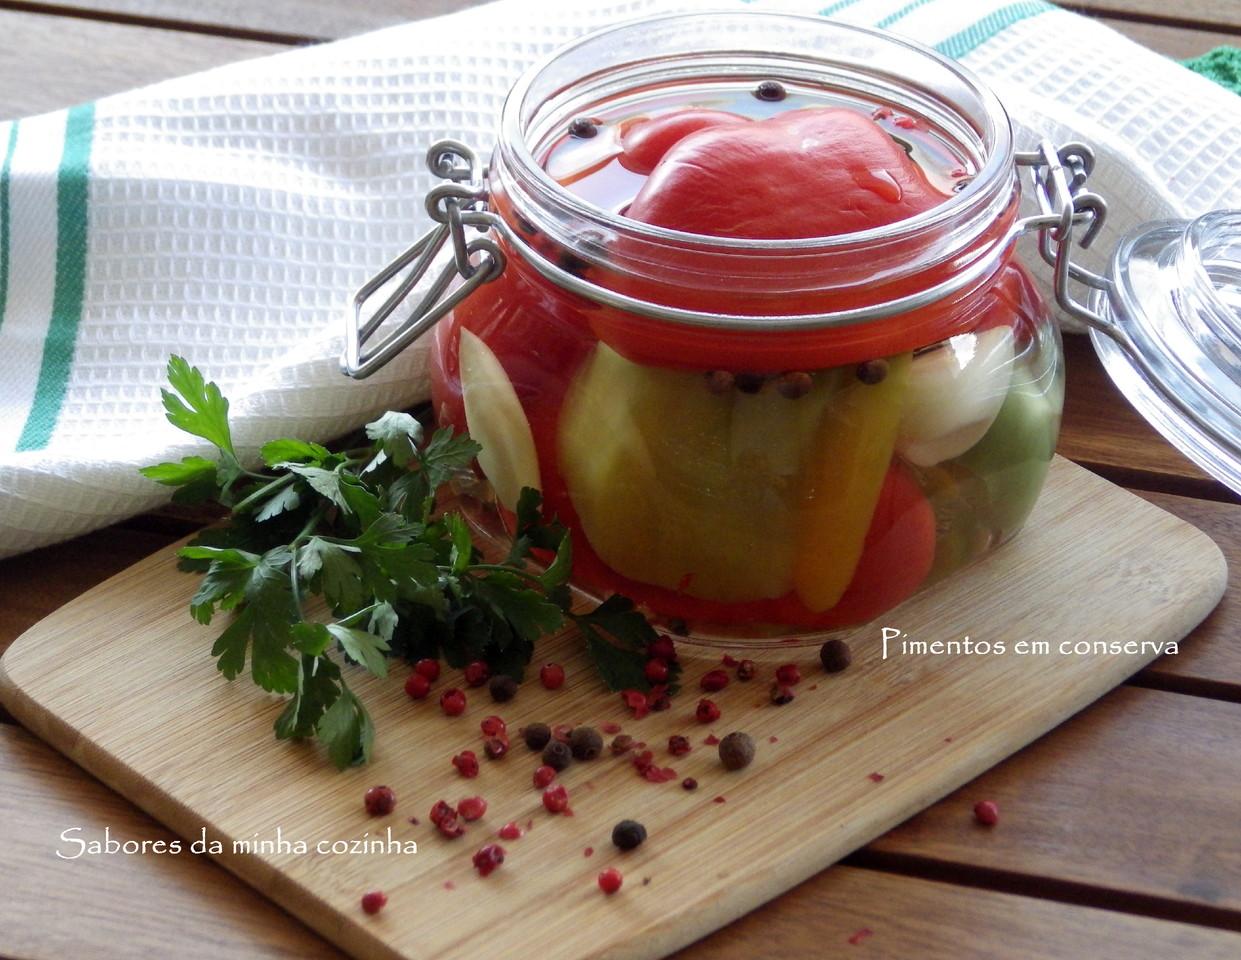 IMGP5316-Pimentos em conserva-Blog.JPG